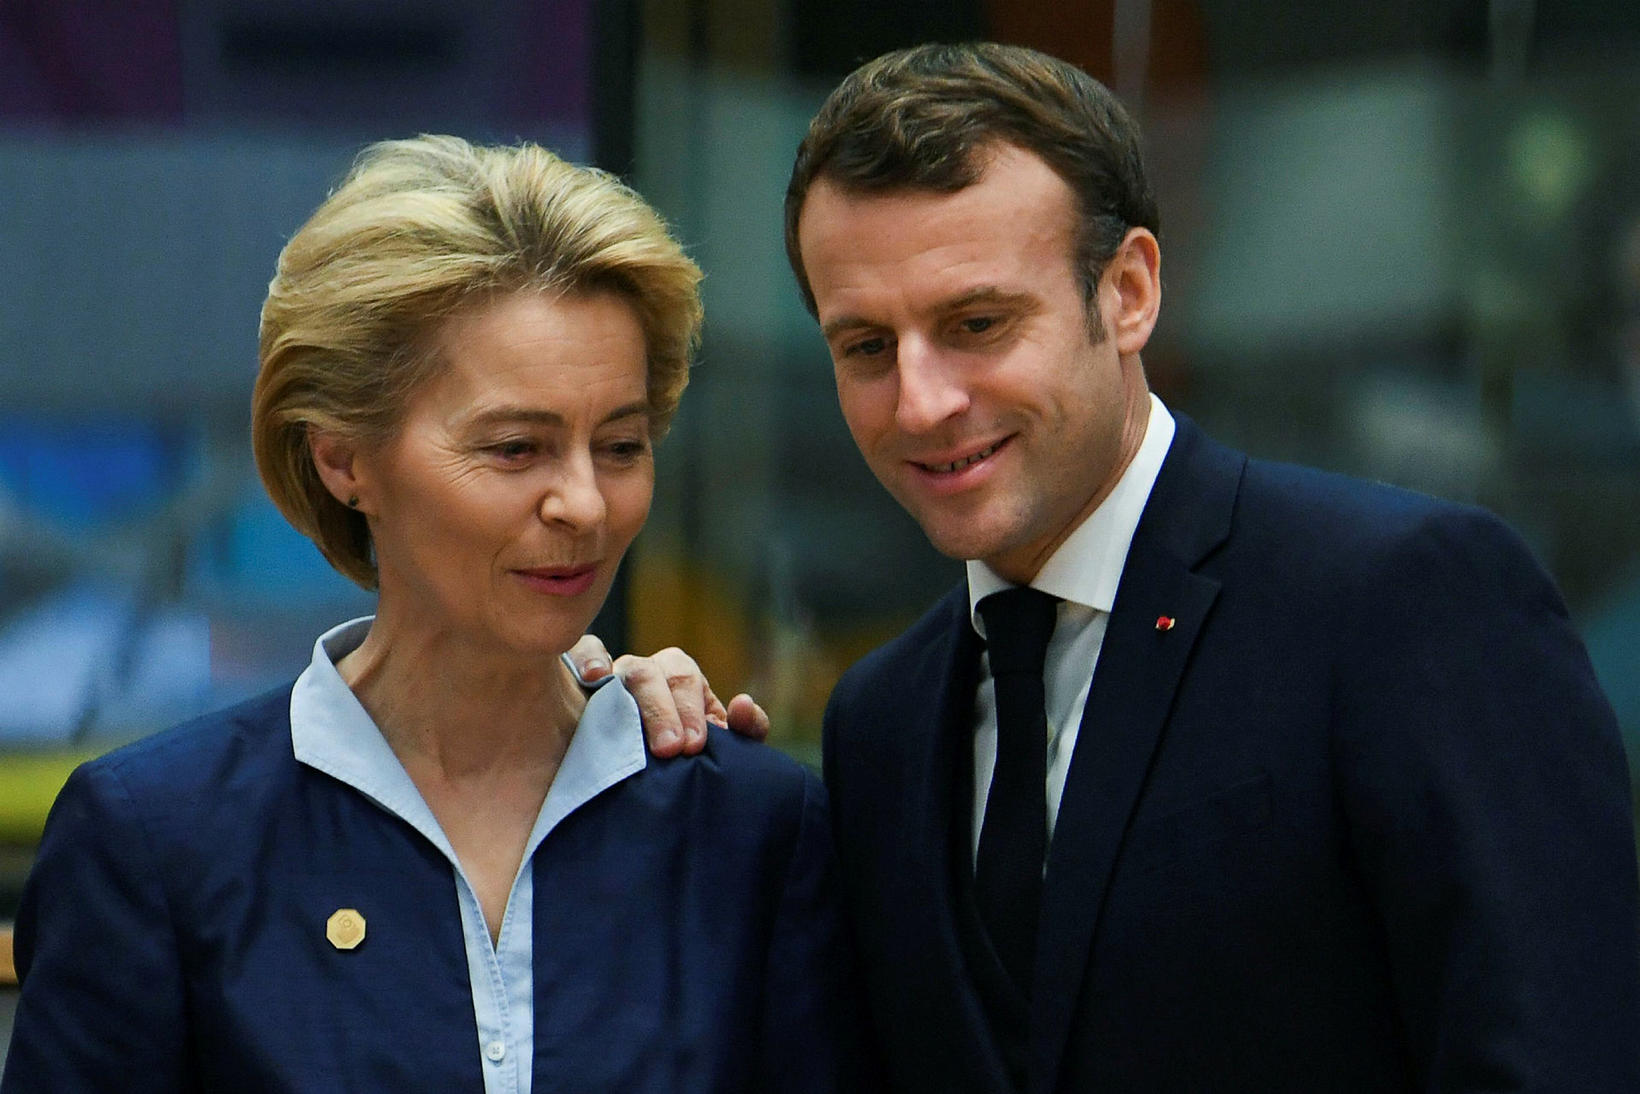 Ursula von der Leyen, forseti framkvæmdastjórnar ESB, og Macron Frakklandsforseti …